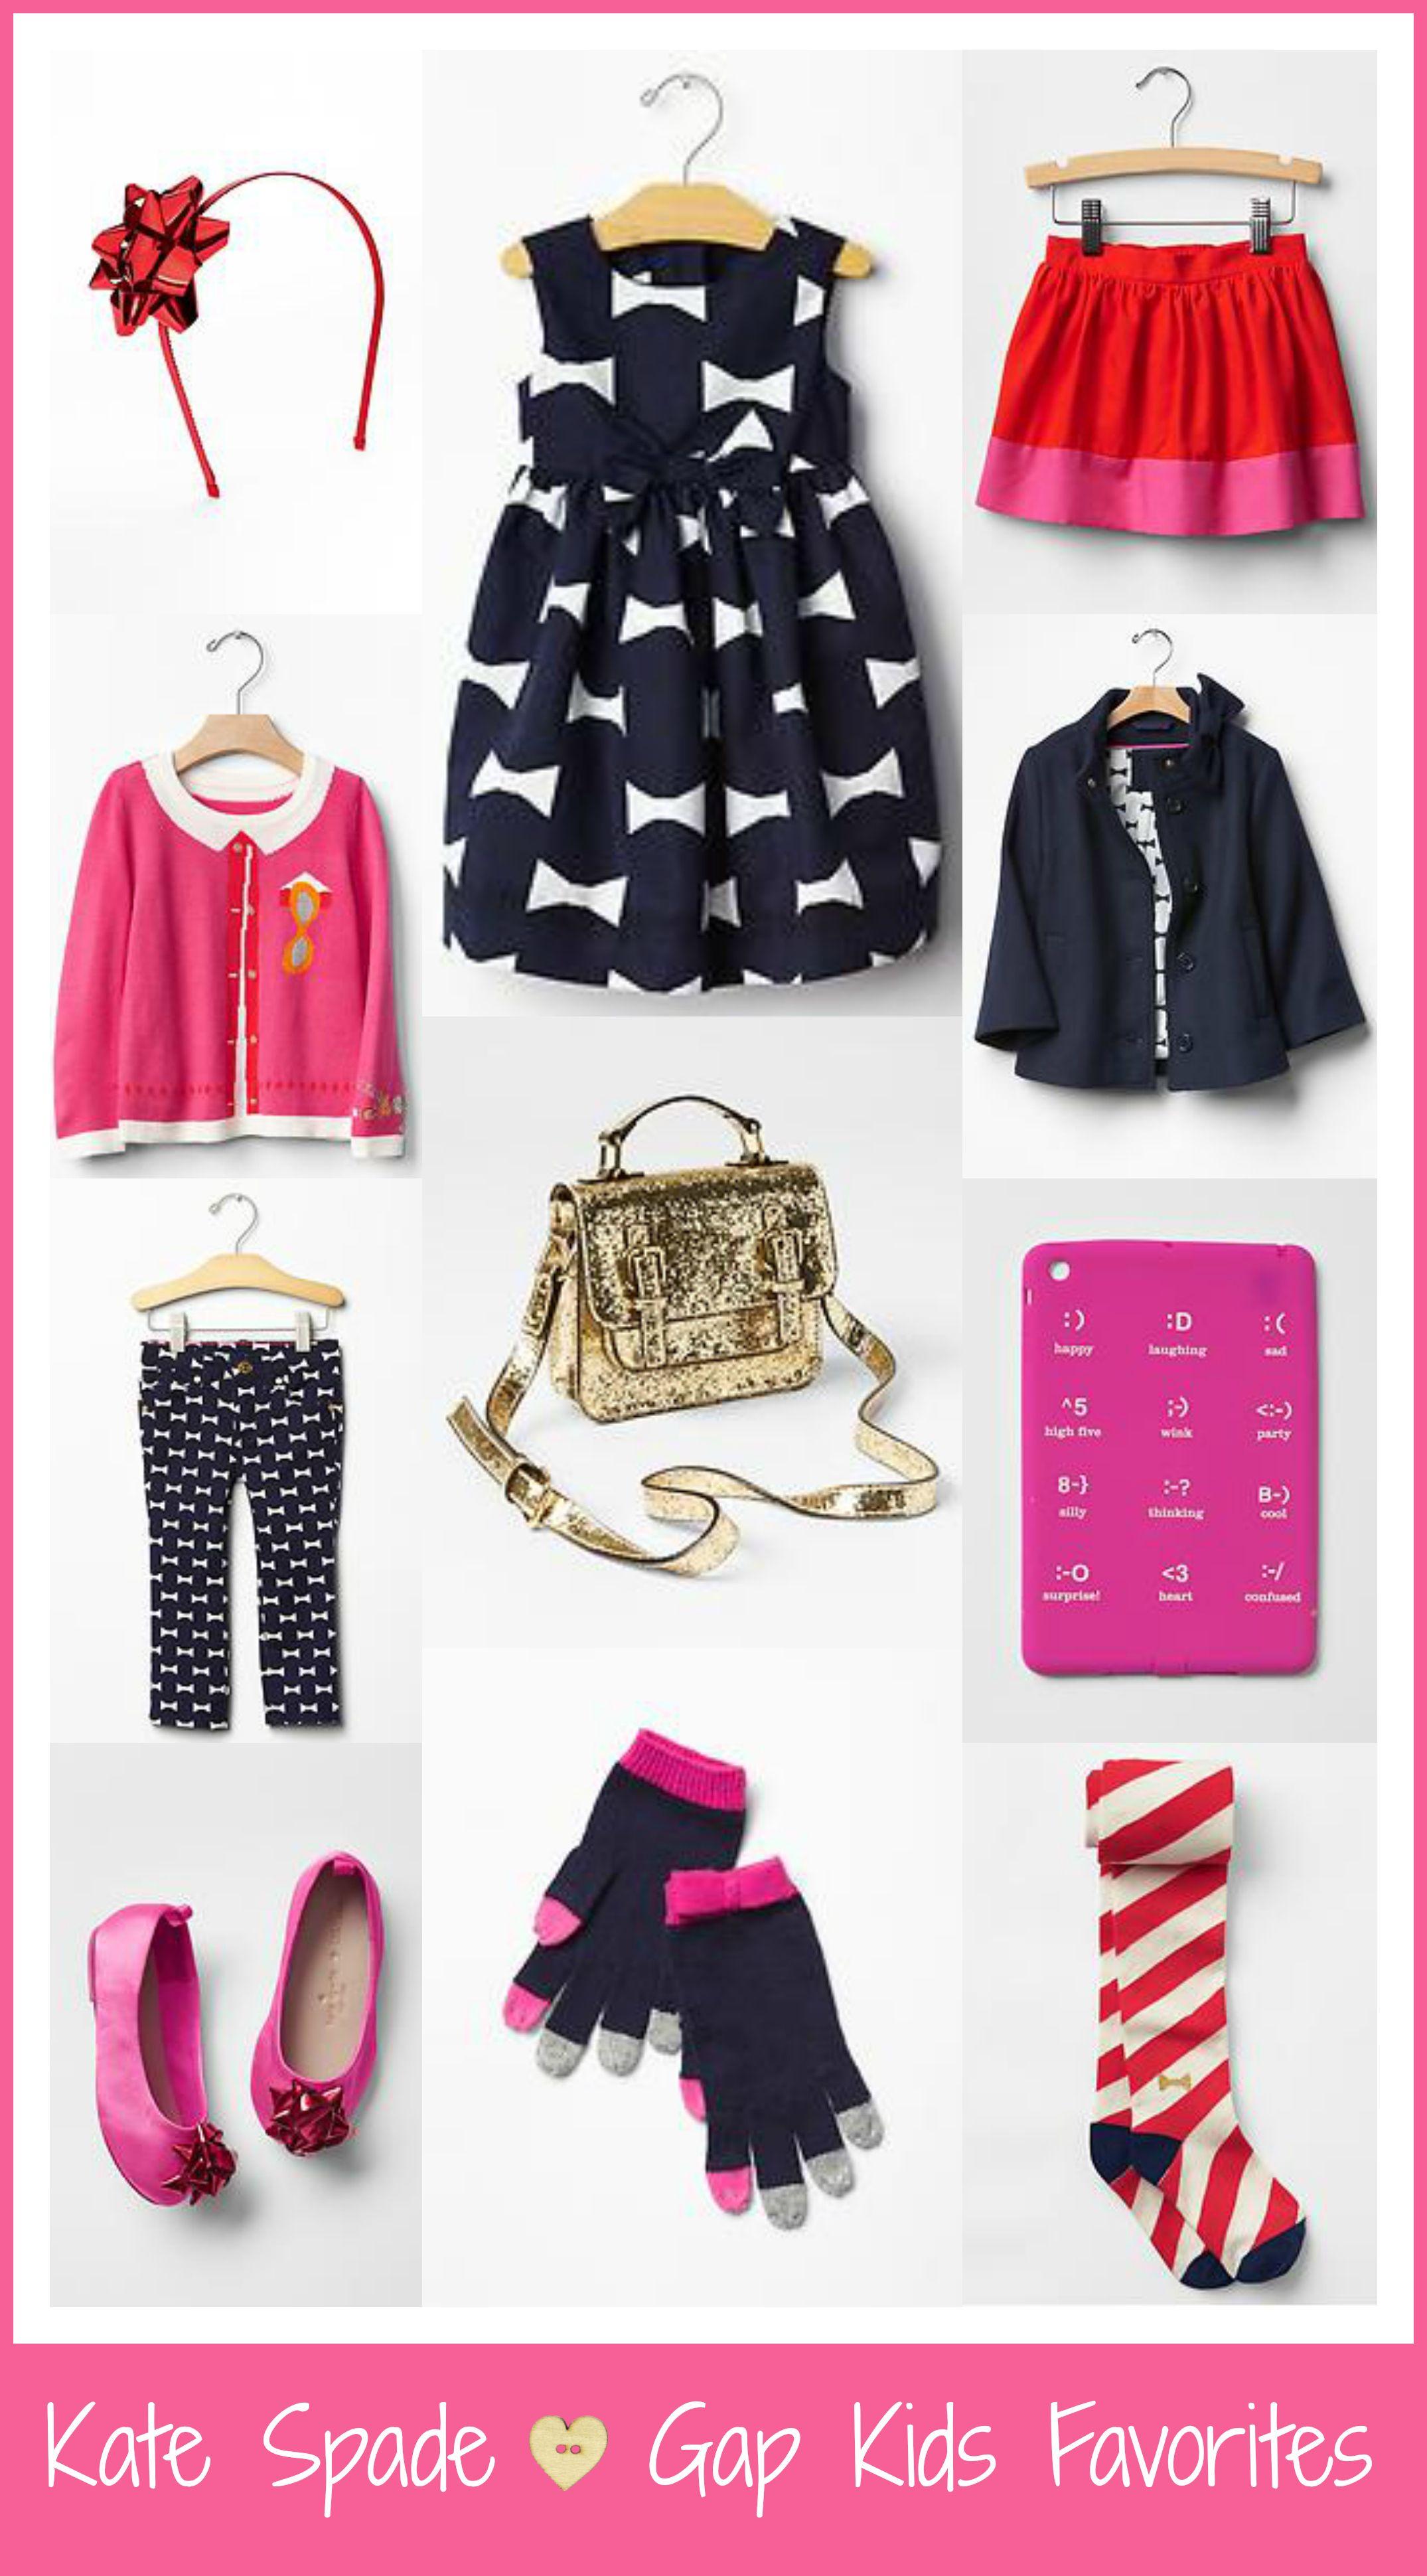 Kate Spade Gap Kids Collection Review Girl Fashion Girl